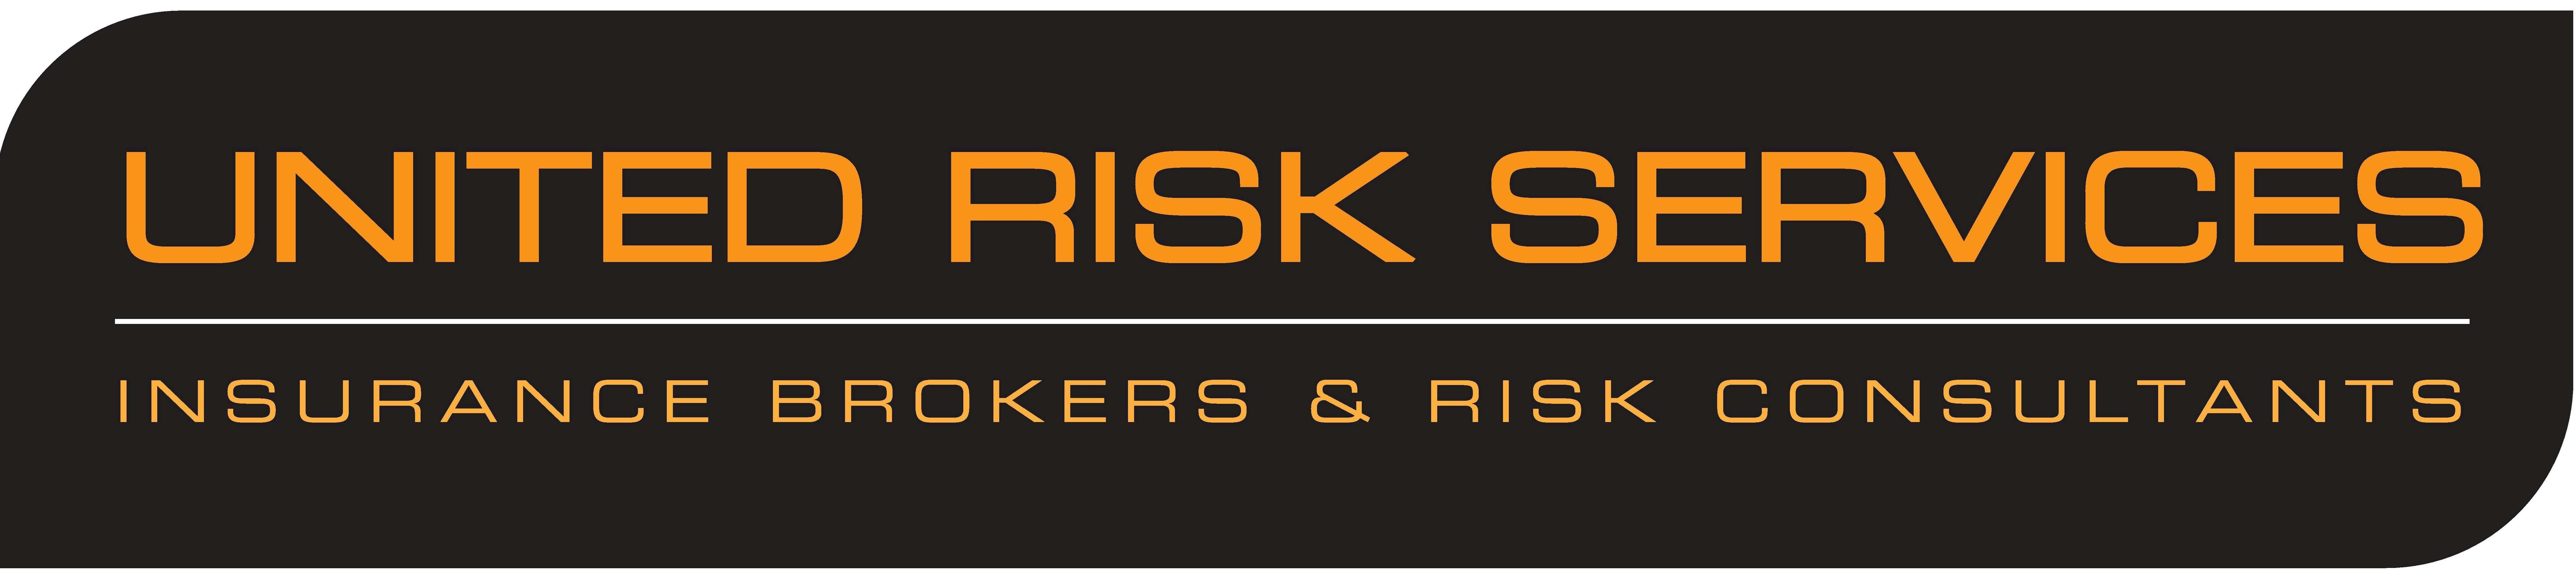 united risk services - high resolution.jpg